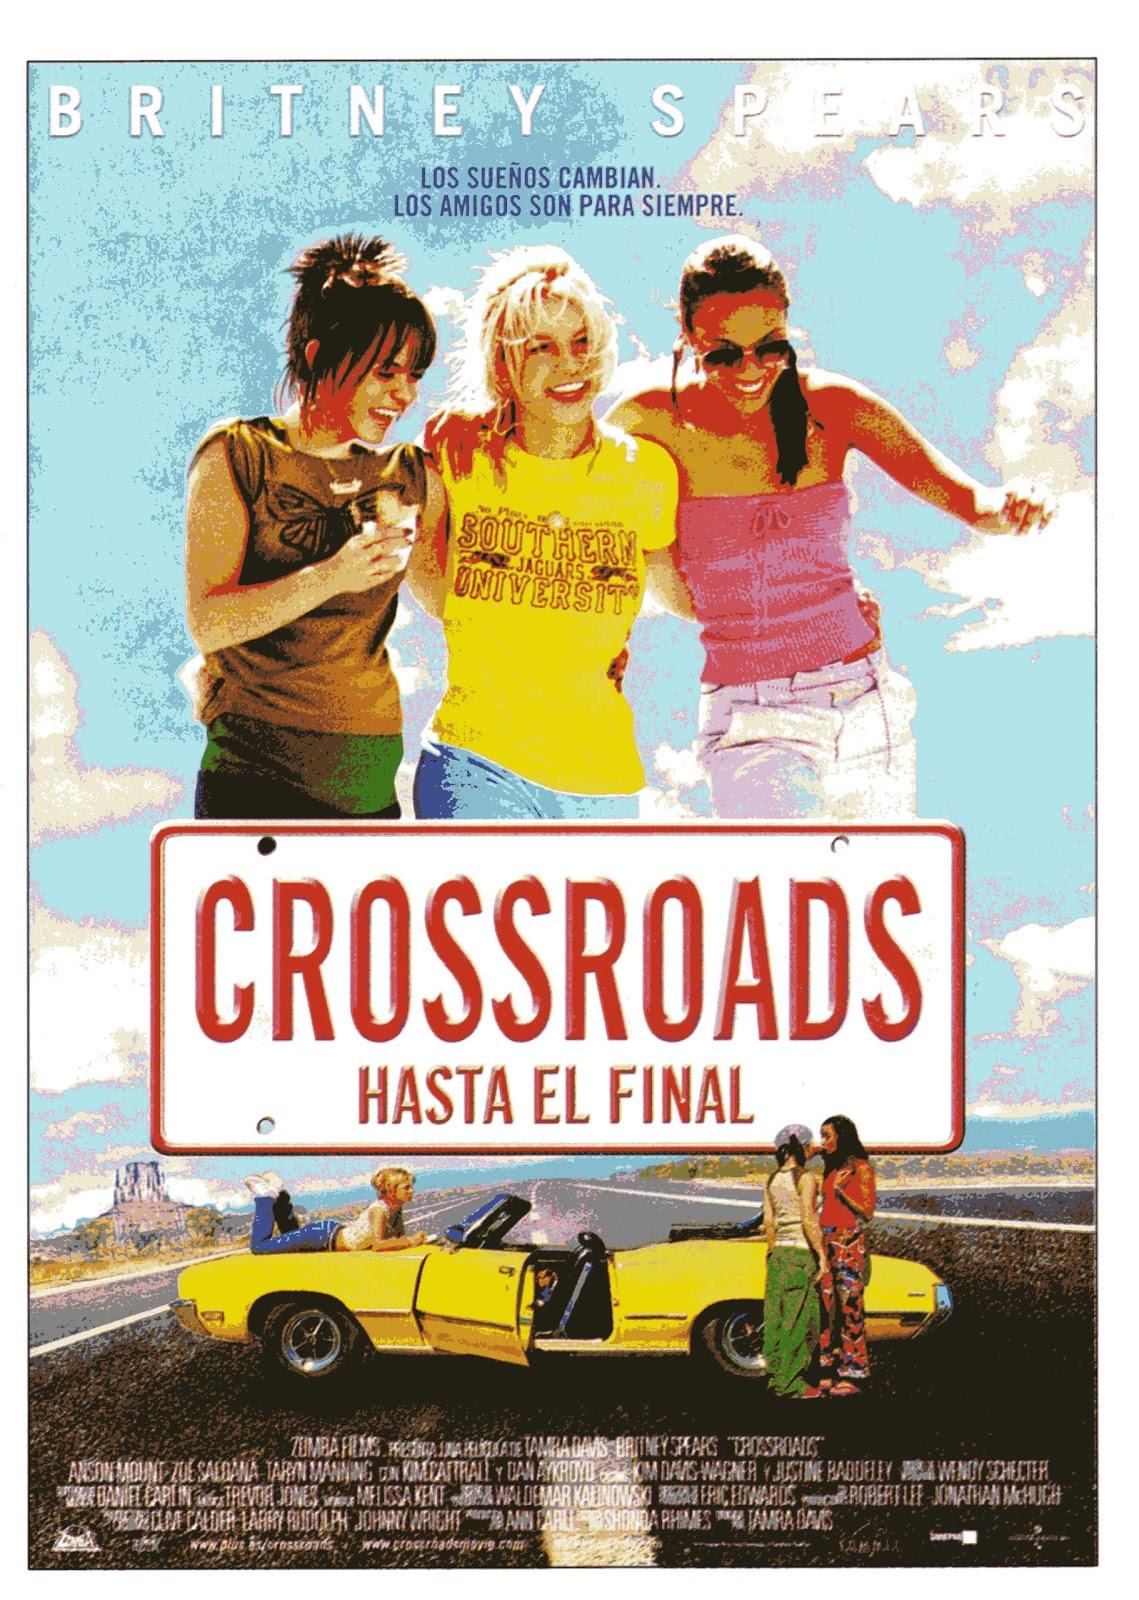 http://3.bp.blogspot.com/-Dy1DrZtuejM/Txqlhn18ciI/AAAAAAAAA9g/YUTUbujCREI/s1600/0392+Crossroads%252C+hasta+el+final.jpg